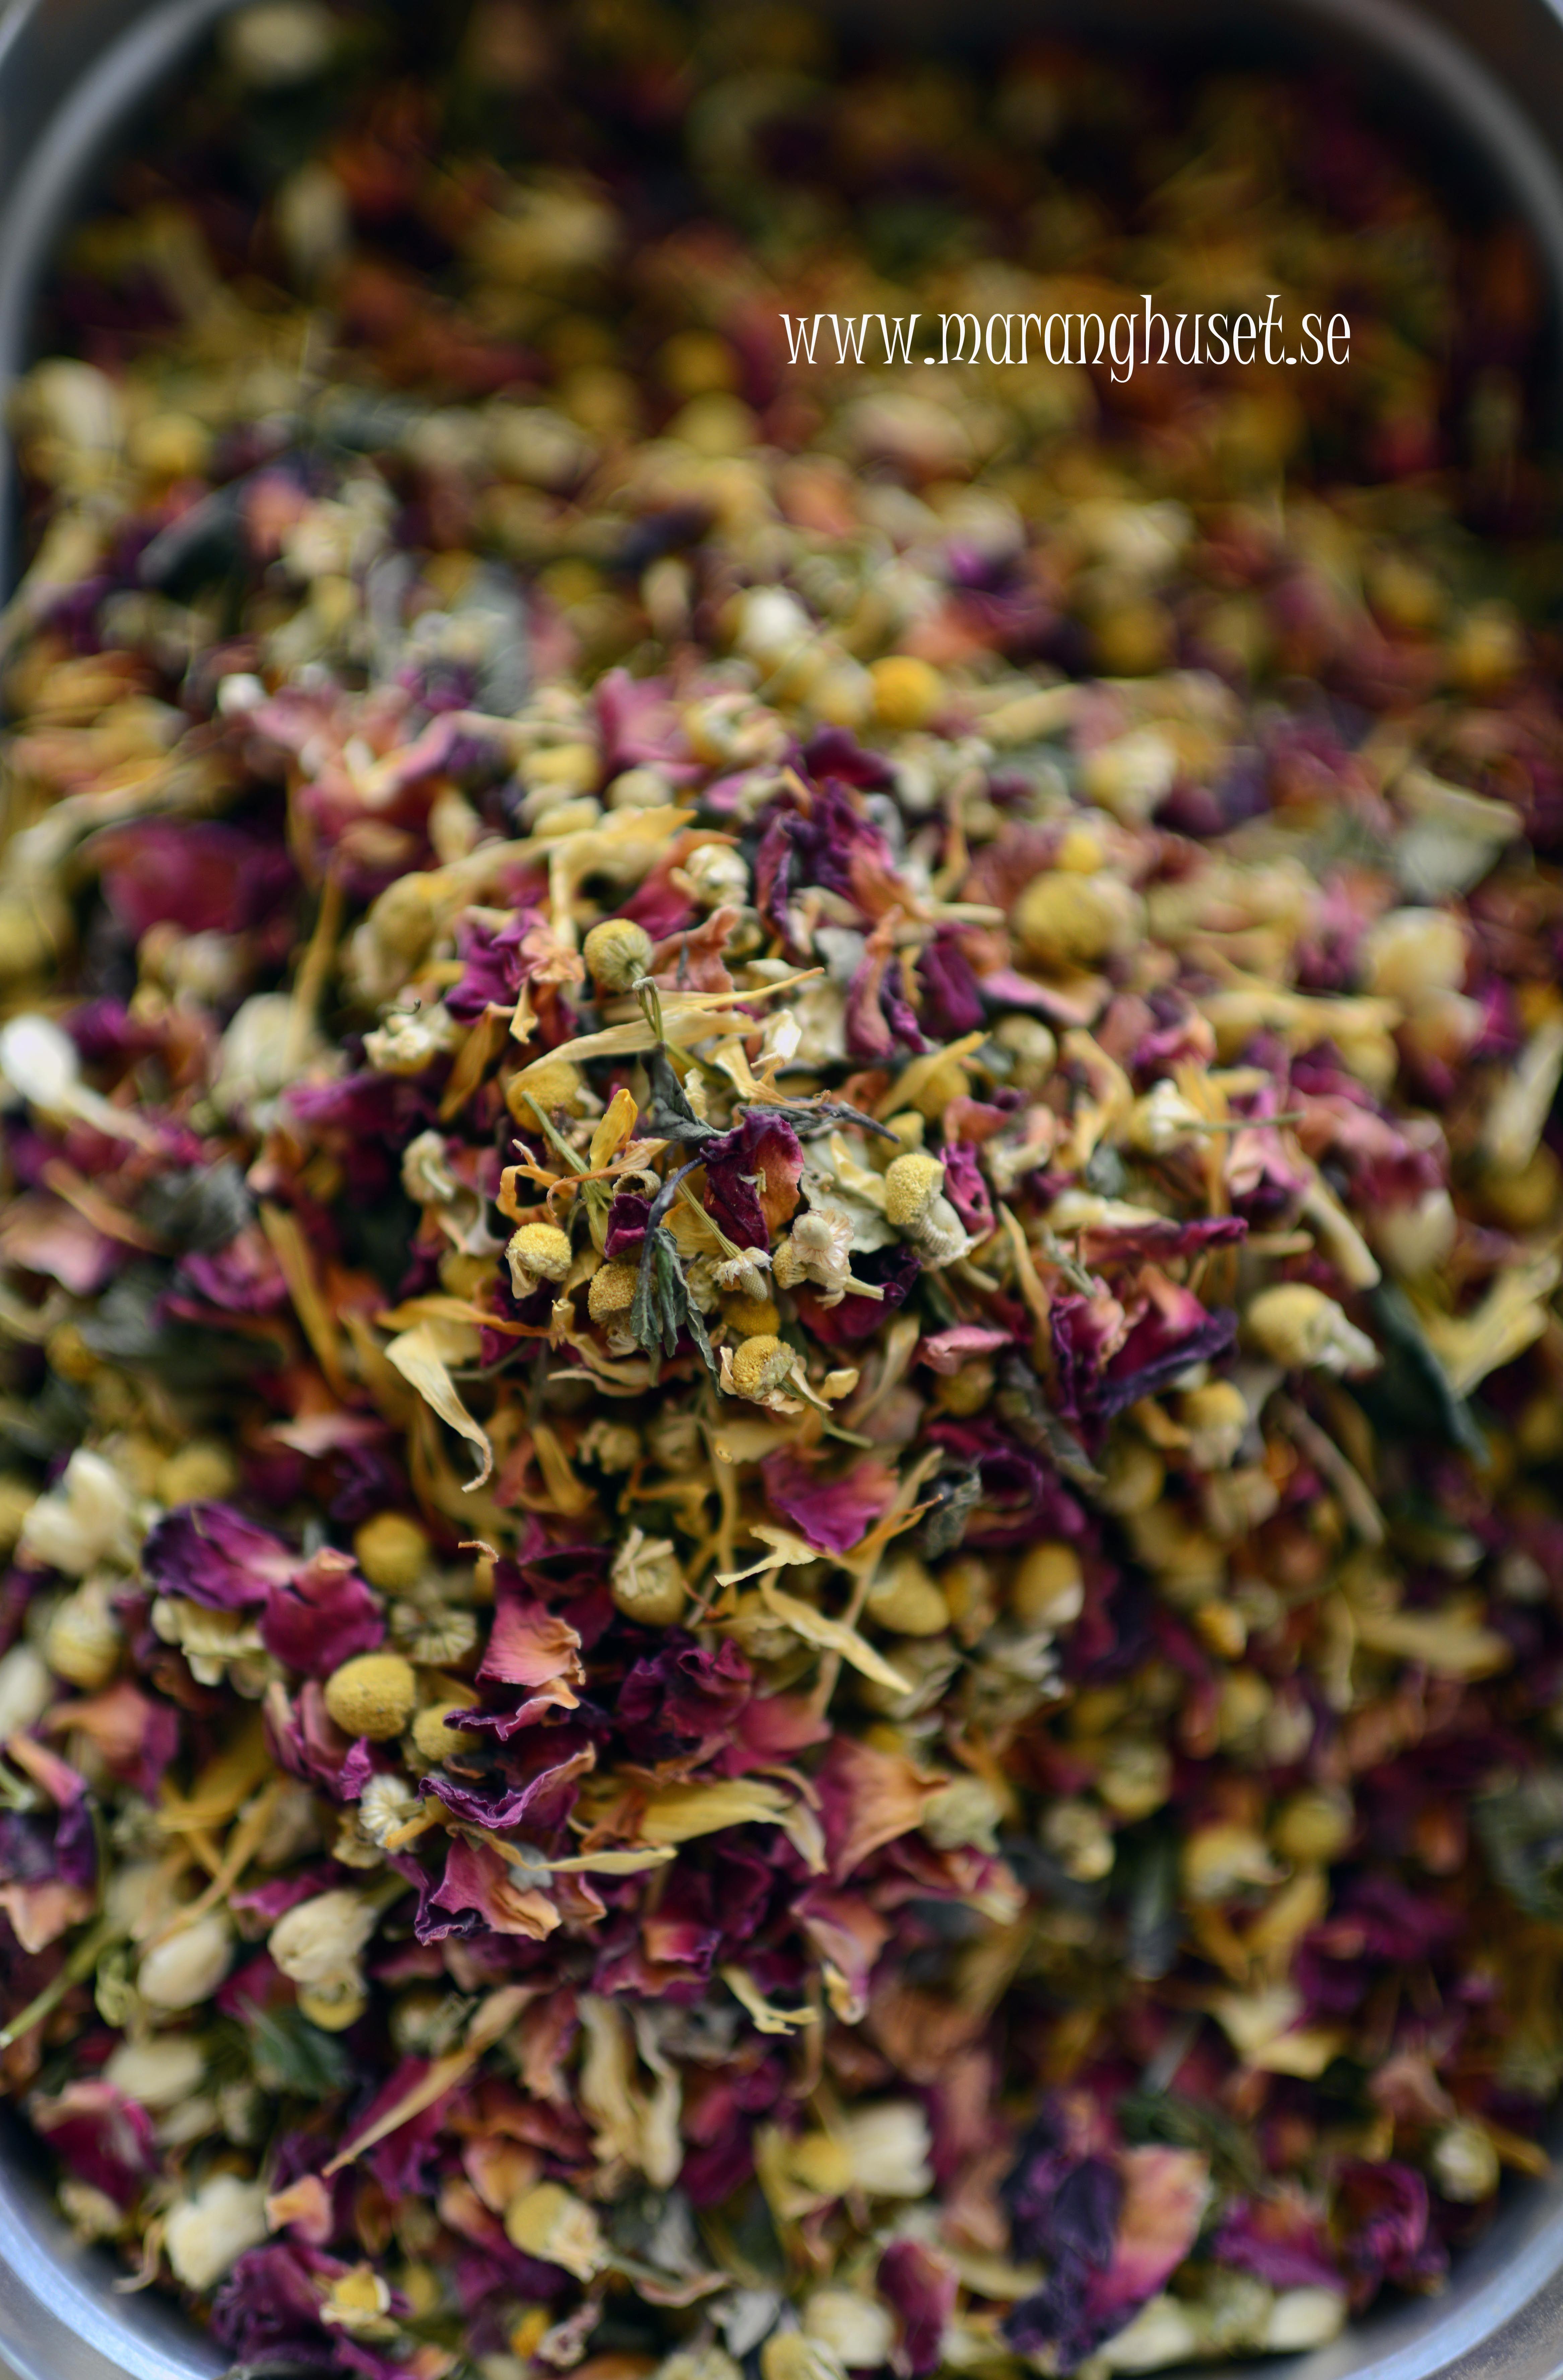 Making new balance tea - calming and focusing - meditation tea